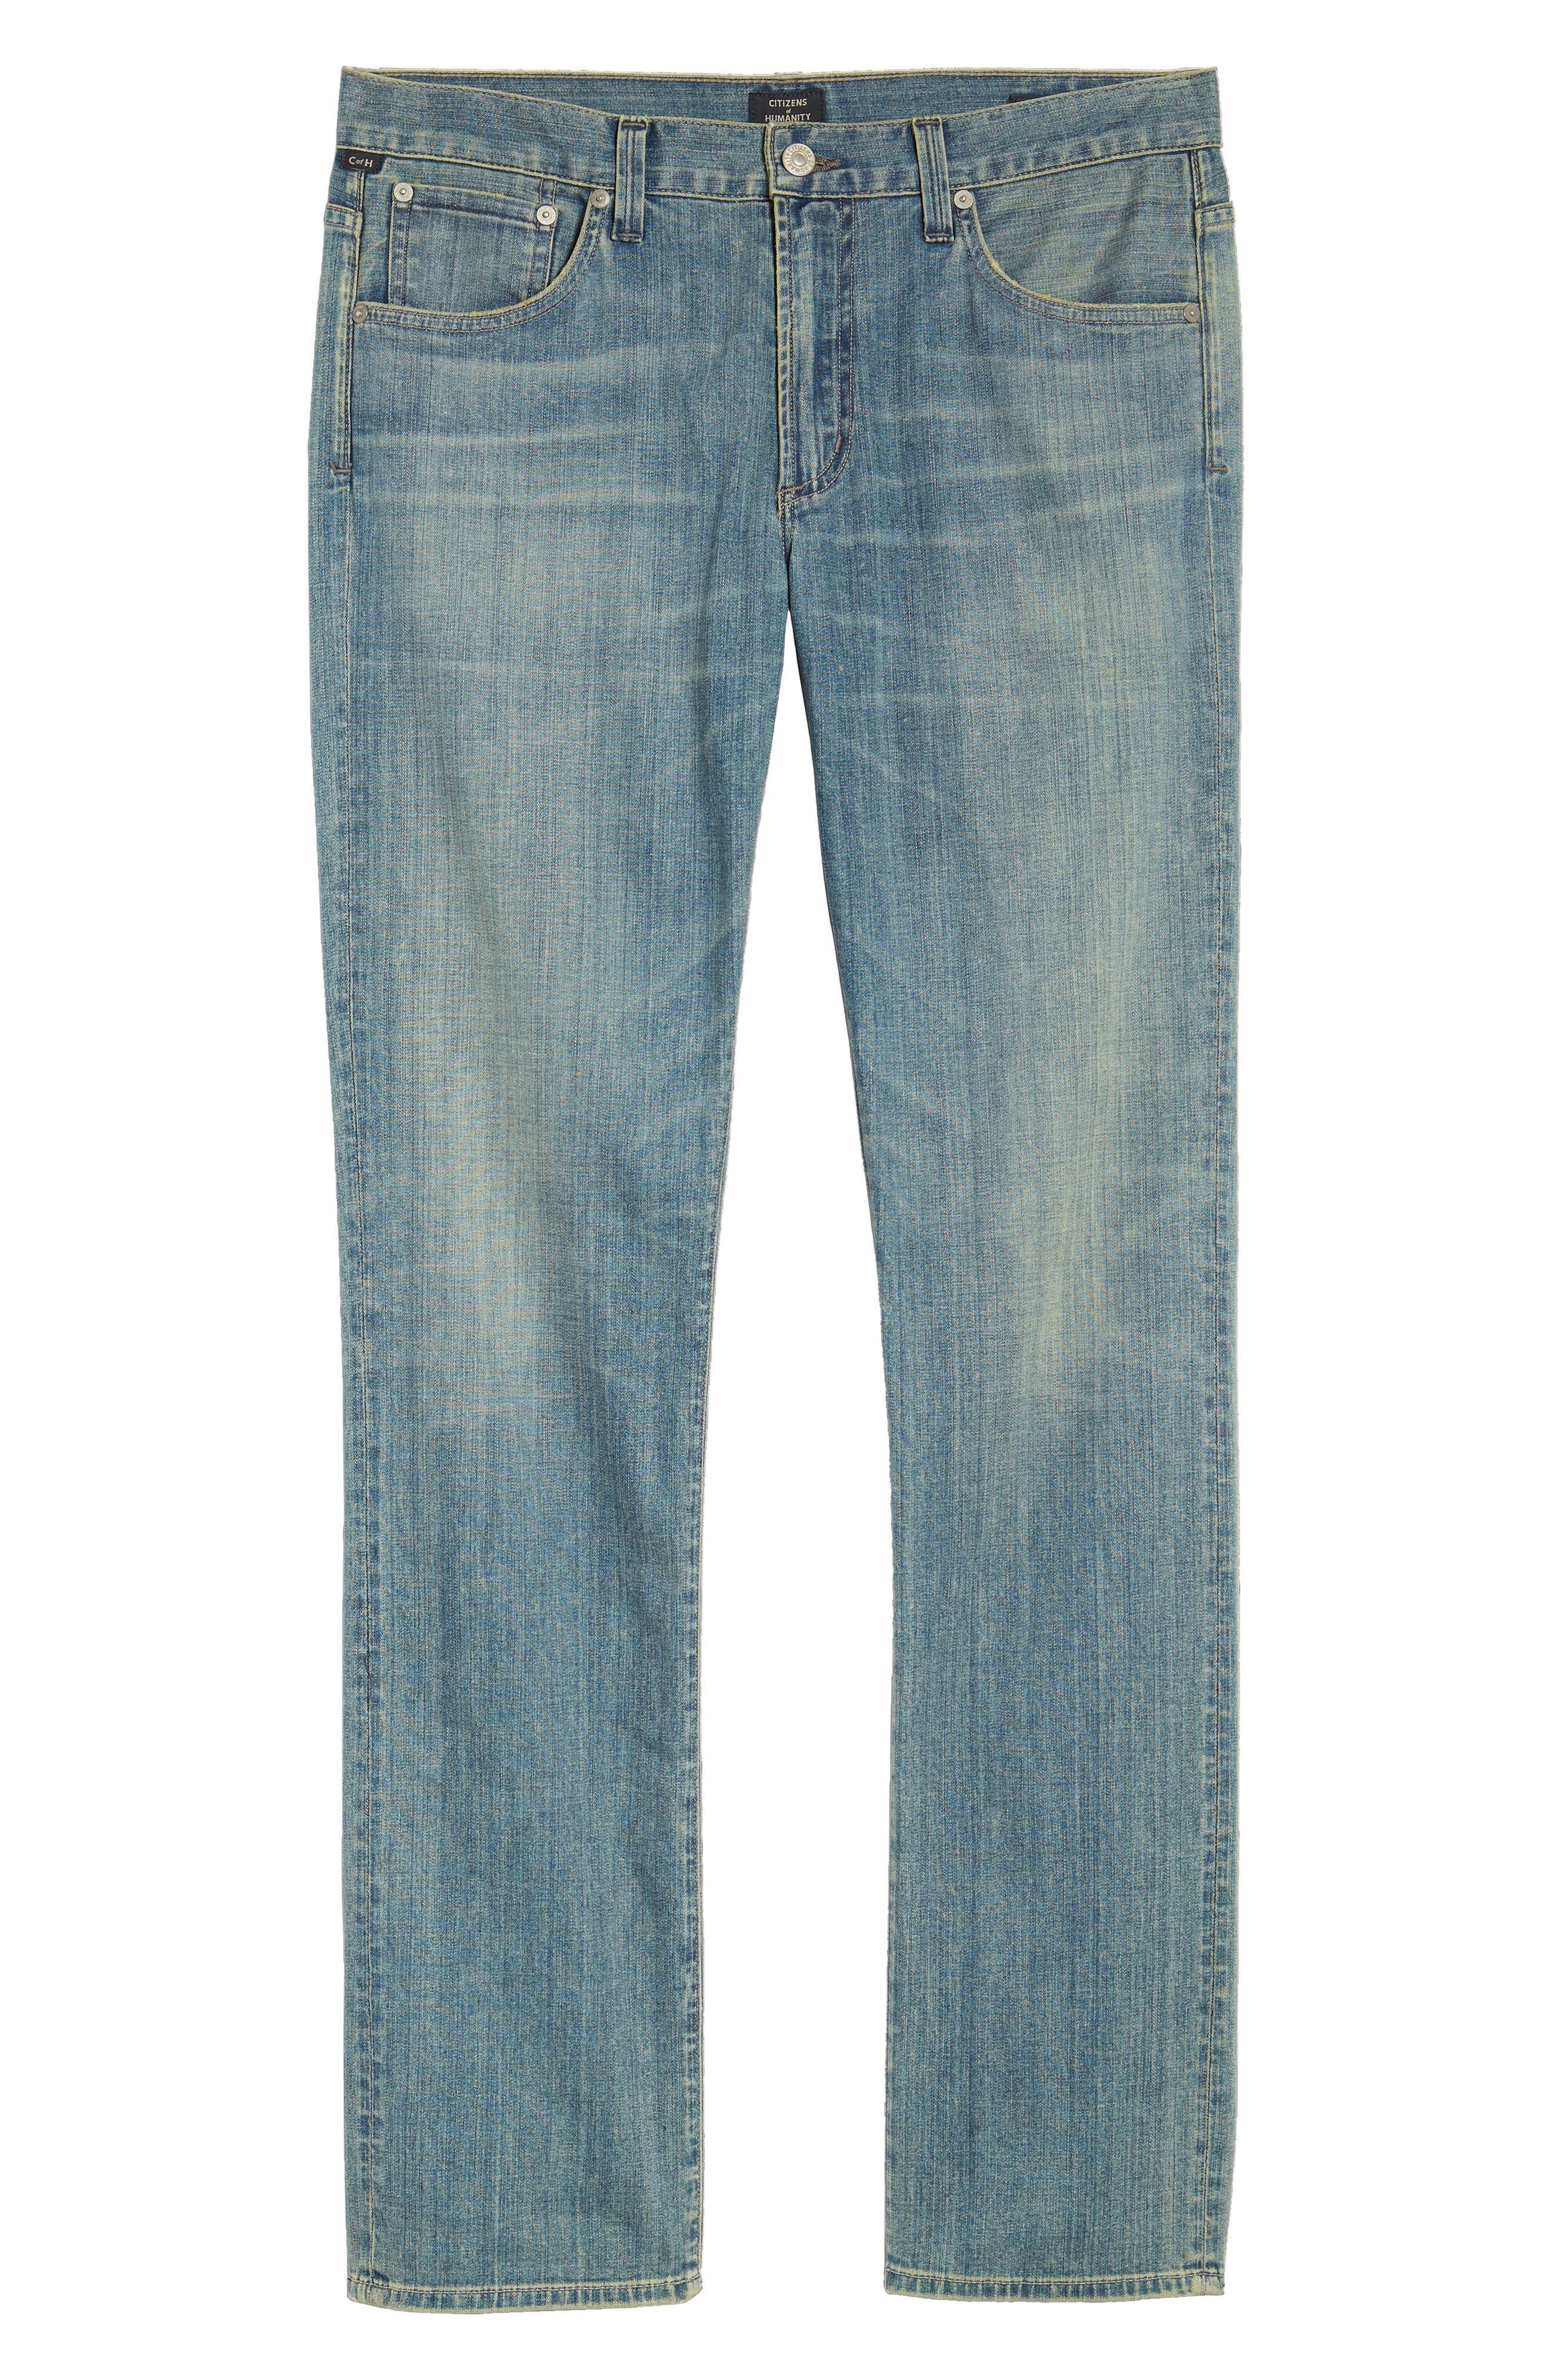 Gage Slim Straight Leg Jeans,                             Alternate thumbnail 6, color,                             464